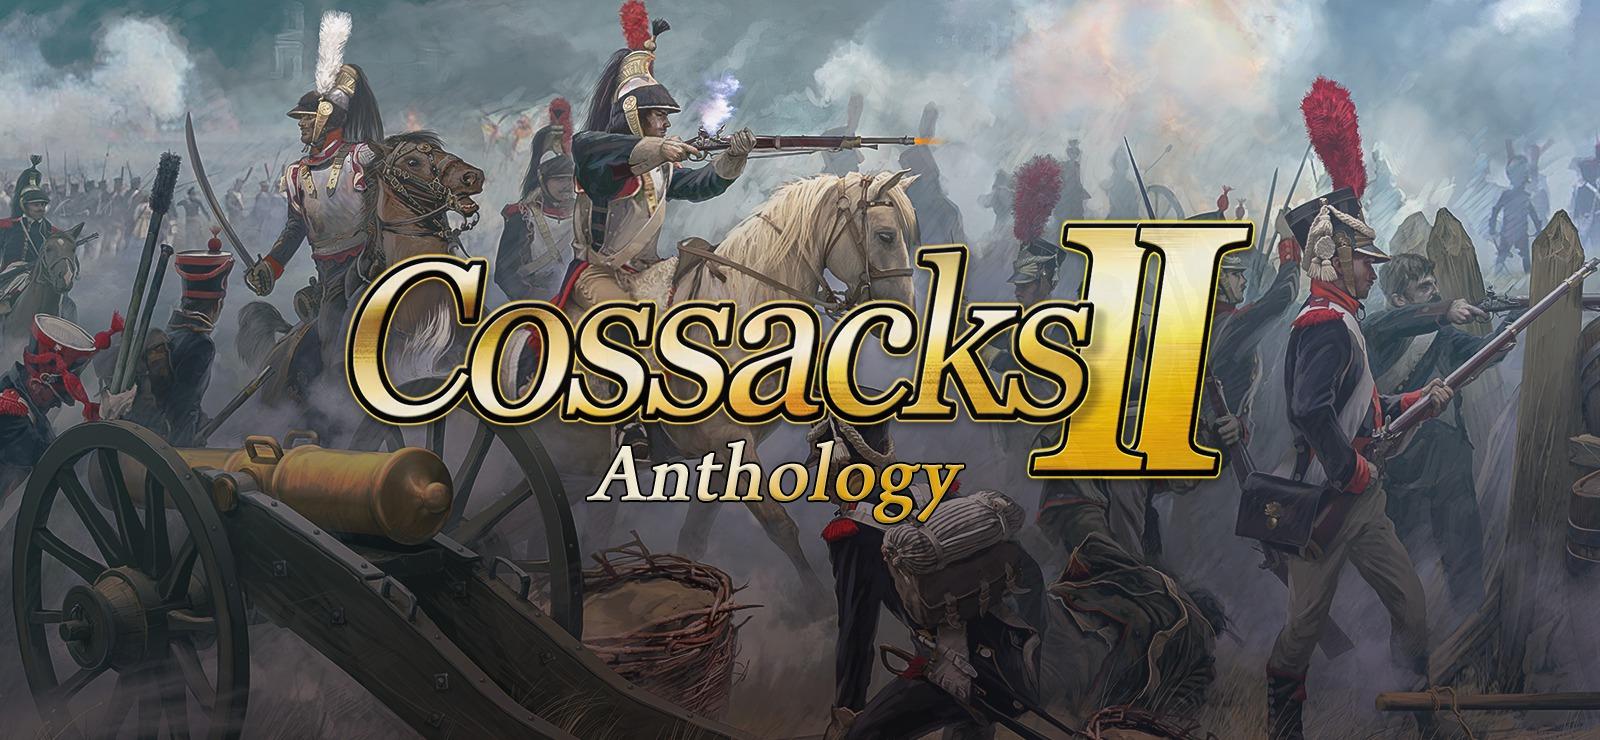 Cossacks II: Napoleonic Wars Free Download